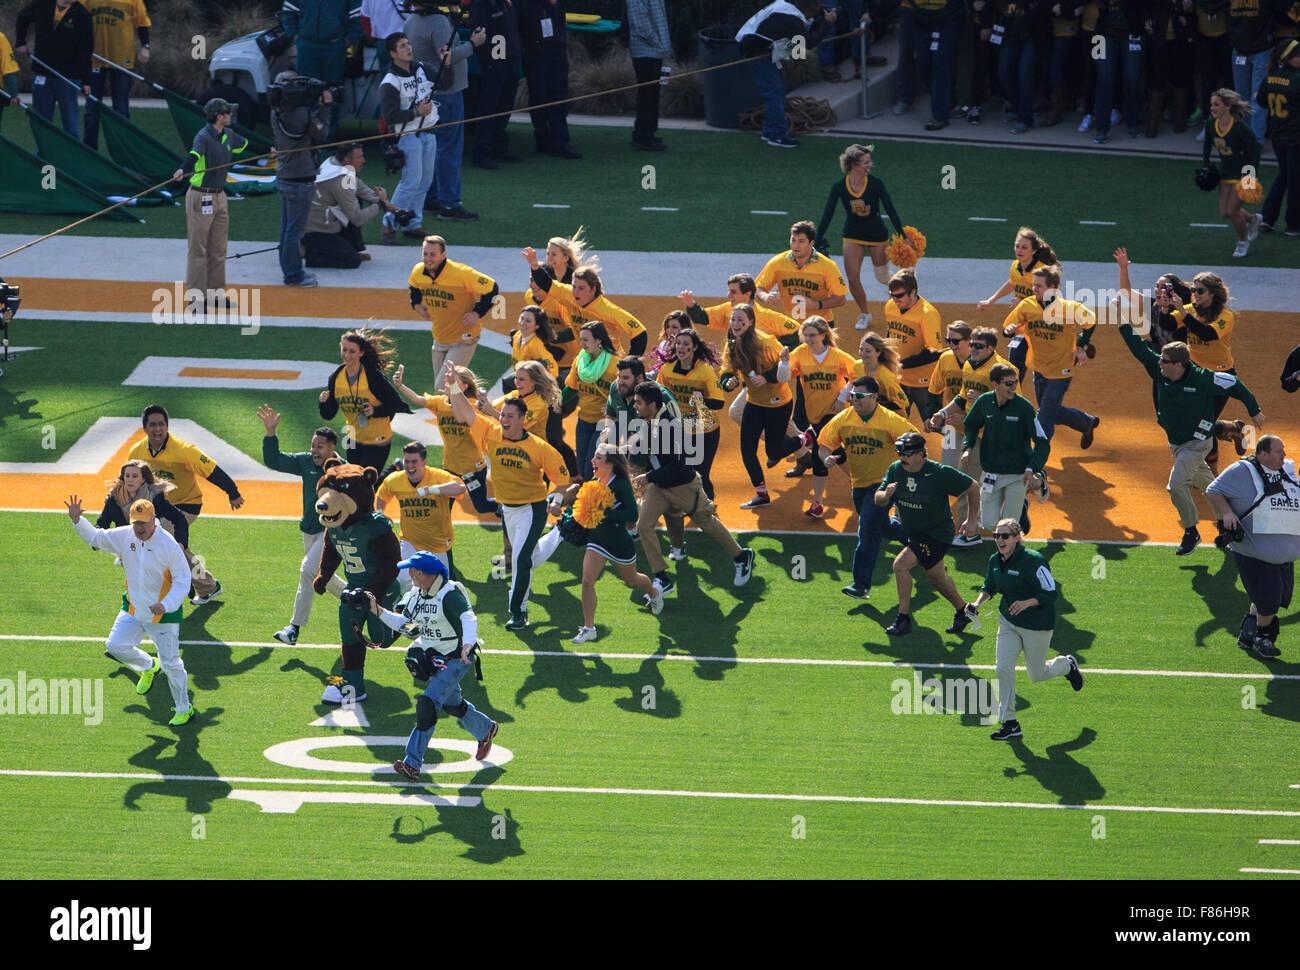 Waco, Texas, USA. 5th Dec, 2015. Baylor Bears senior line members enter the stadium during the NCAA football game between Texas vs Baylor at McLane Stadium in Waco, Texas. © csm/Alamy Live News Stock Photo